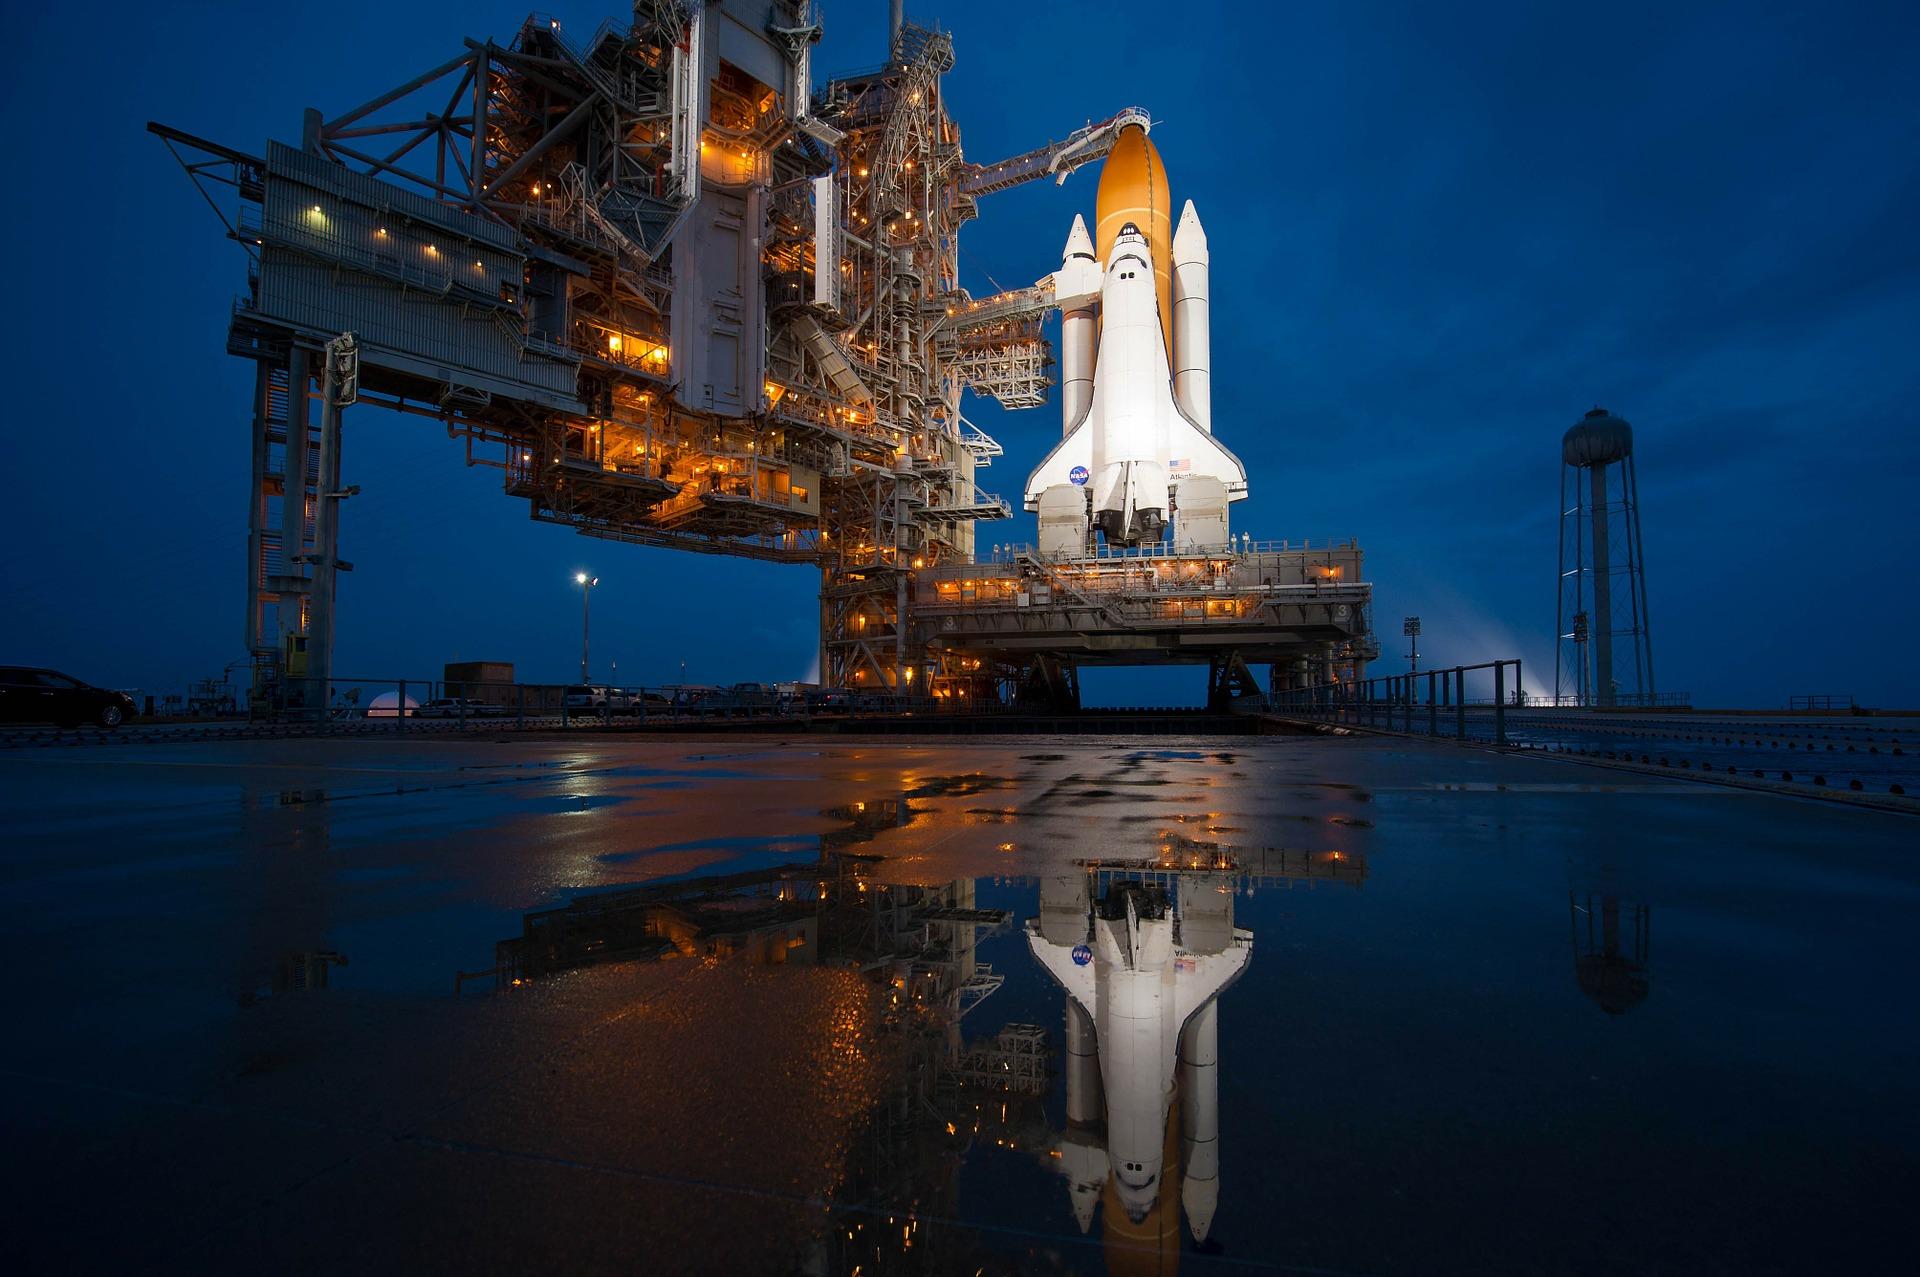 Cape Canaveral e Kennedy Space Center